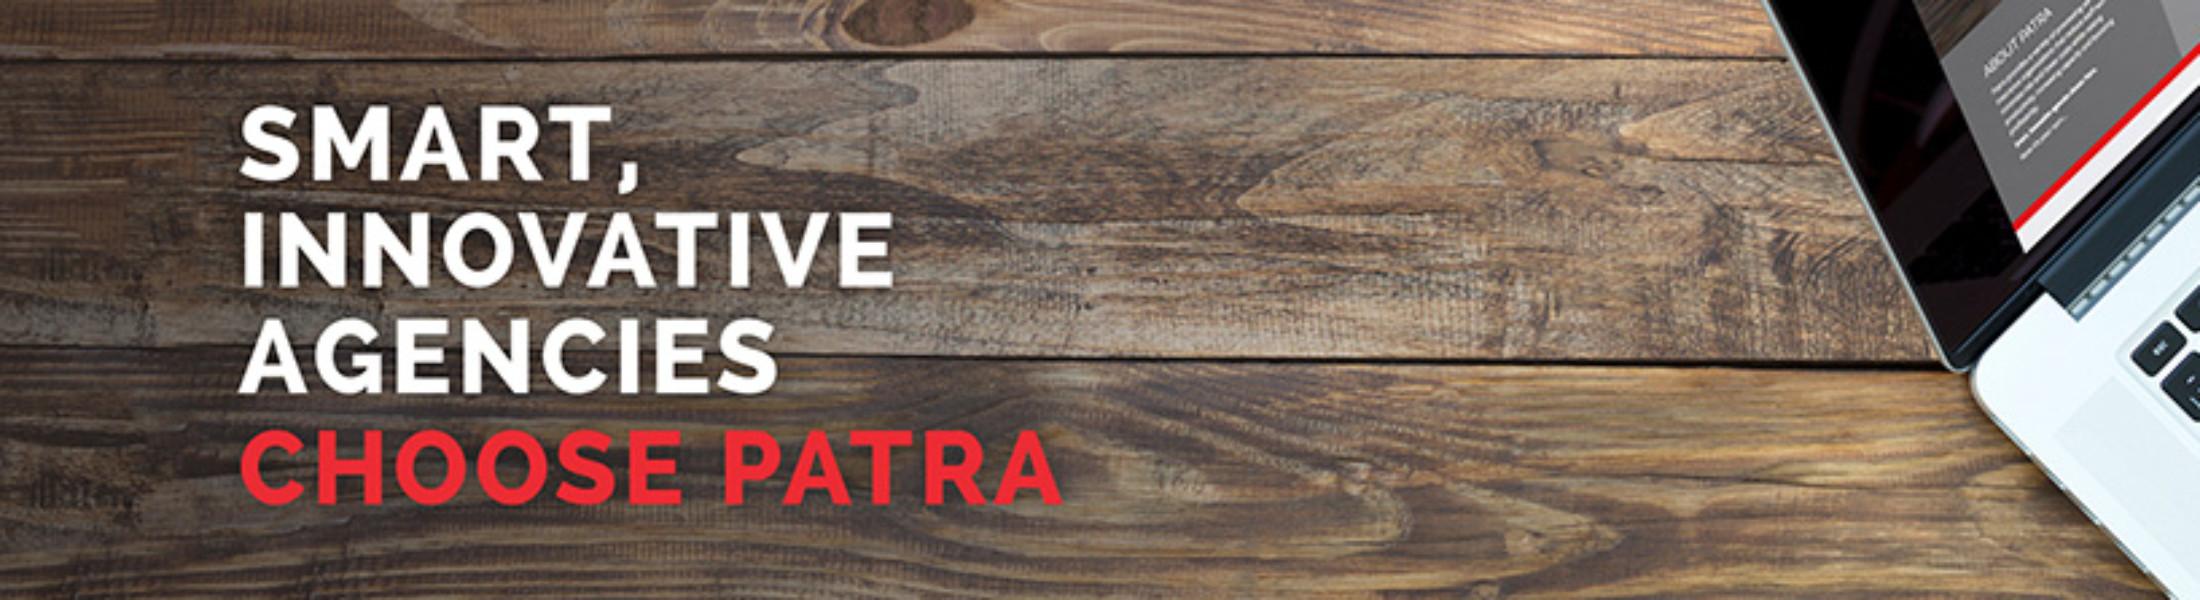 hardwood floor installation charlotte nc of patra corp for slider img 1 2200x600 c